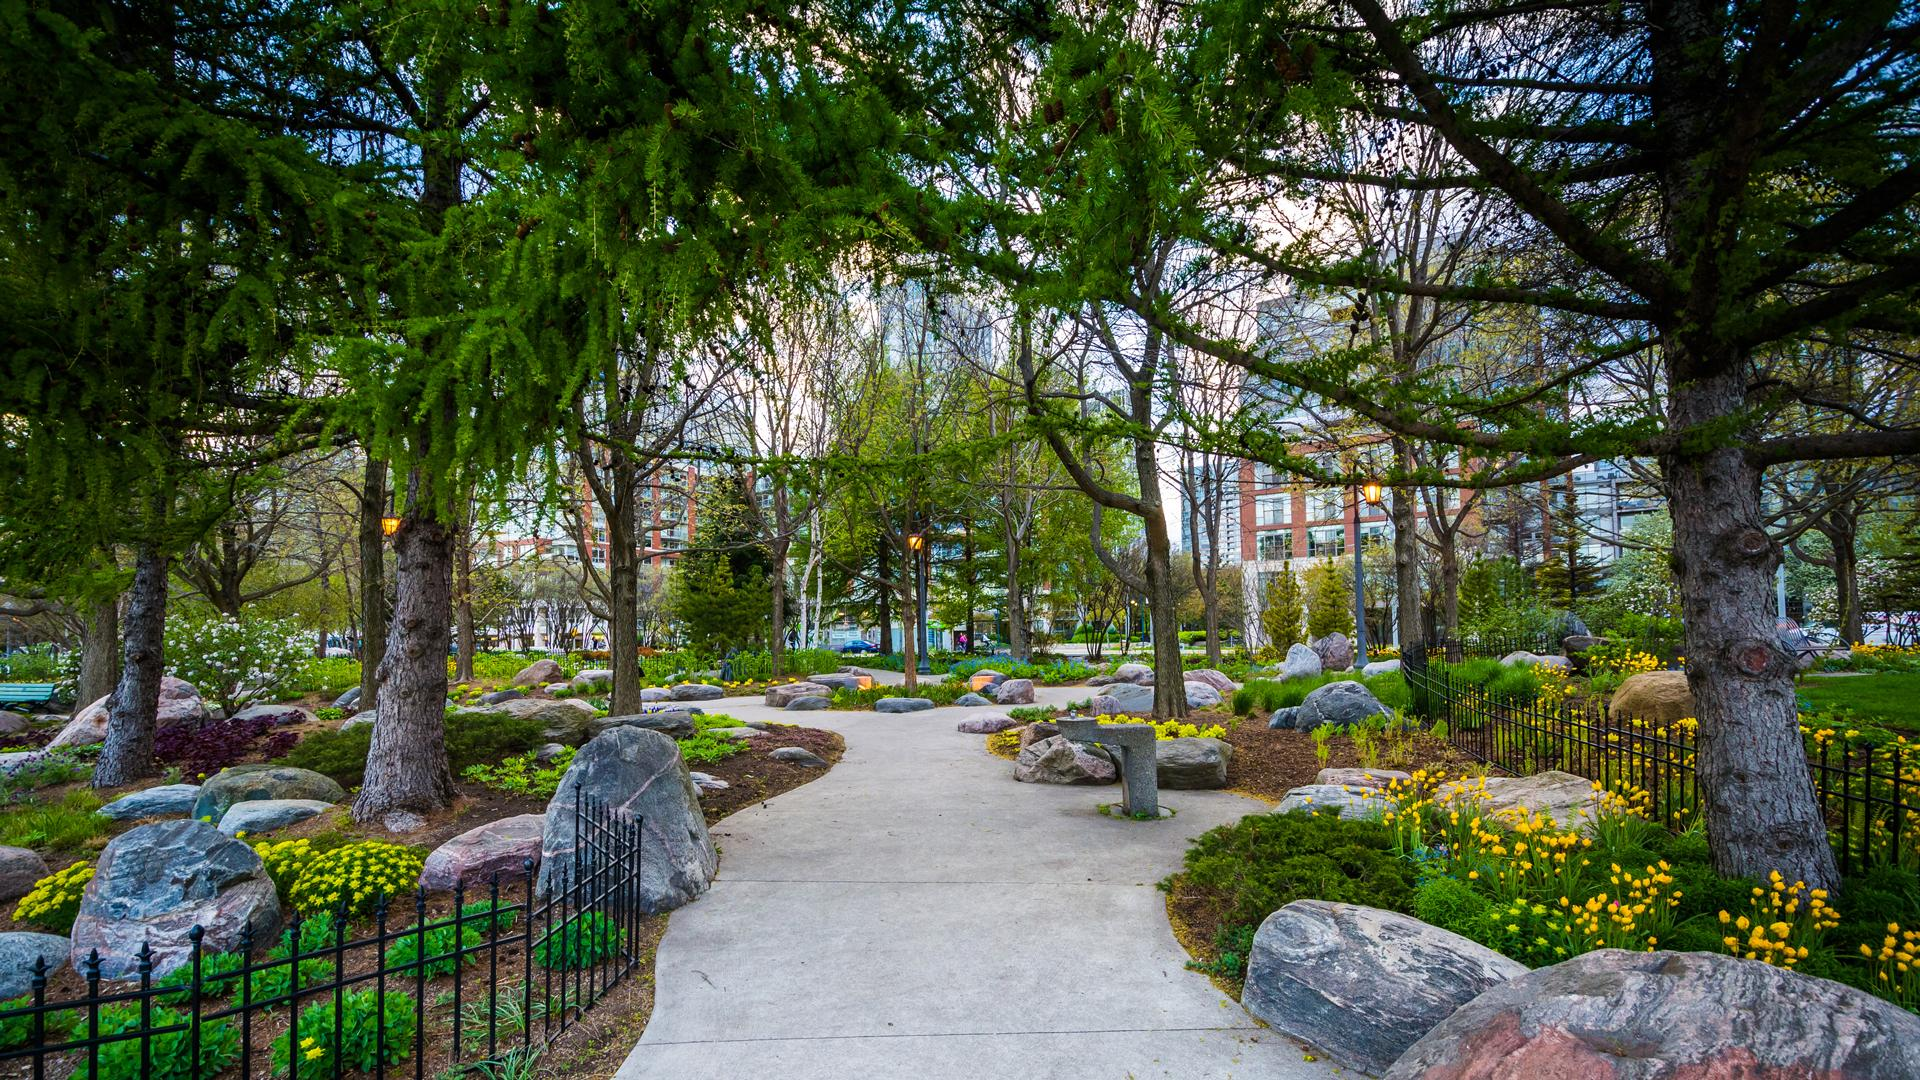 The best walking trails in Toronto | The Toronto Music Garden